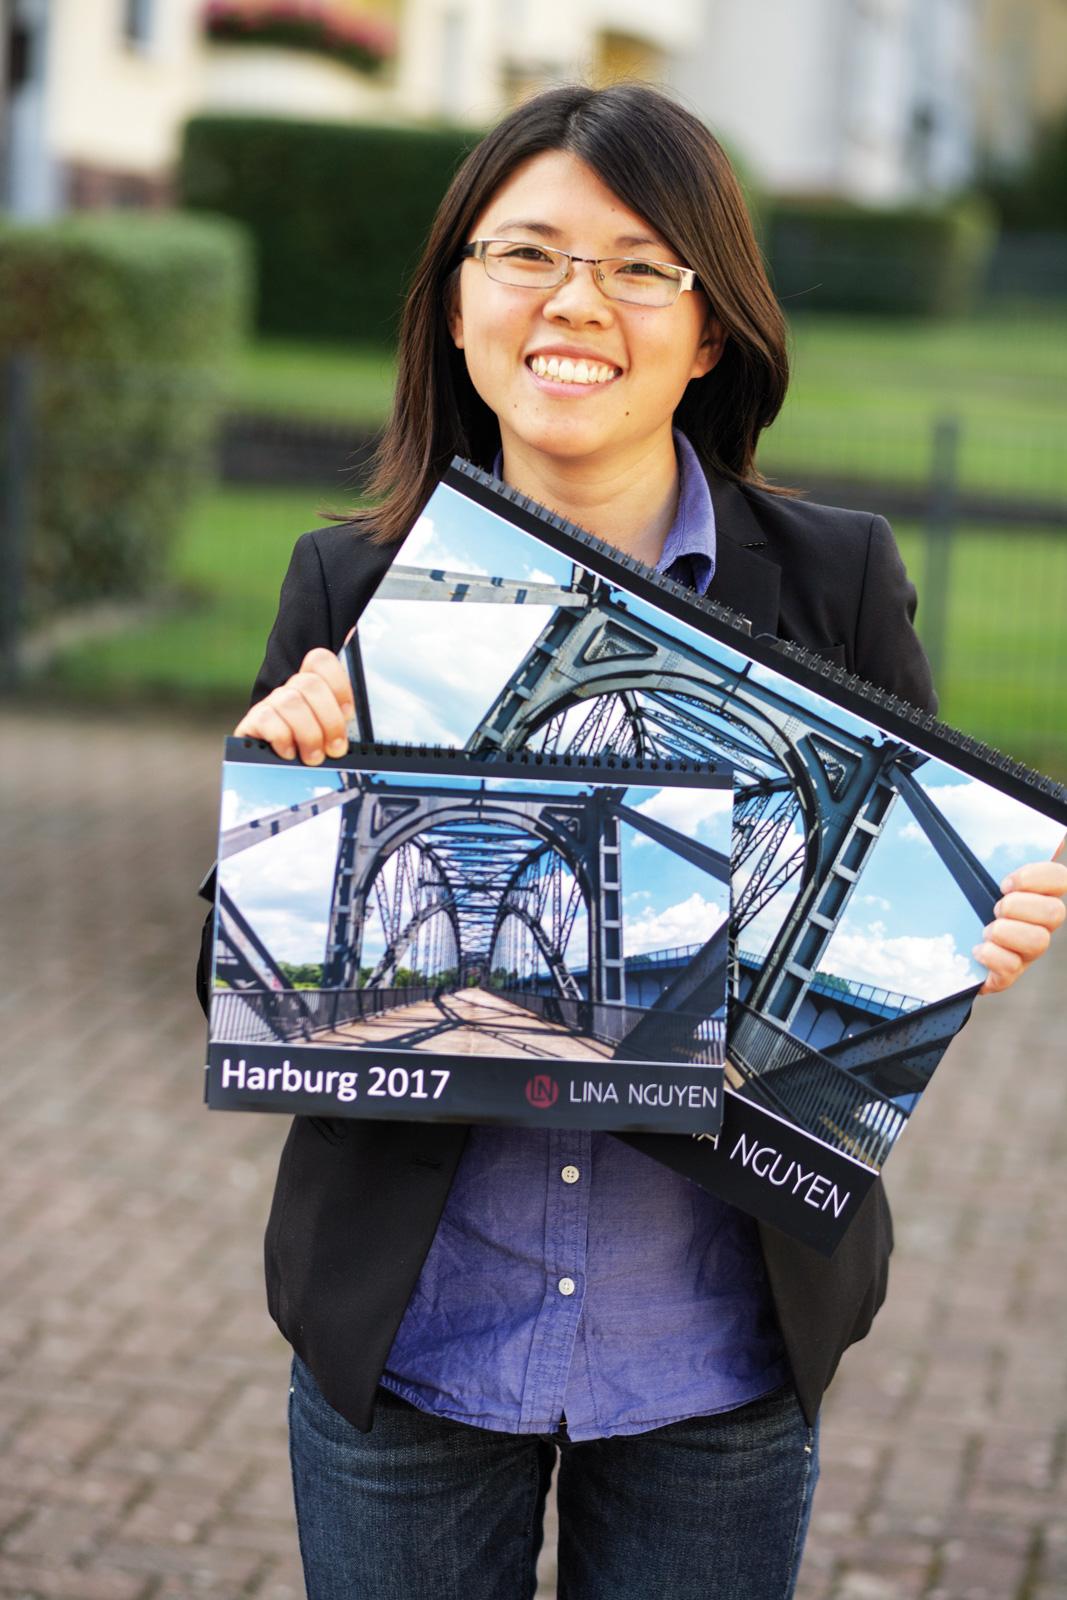 Lina Nguyens Harburg Kalender 2017